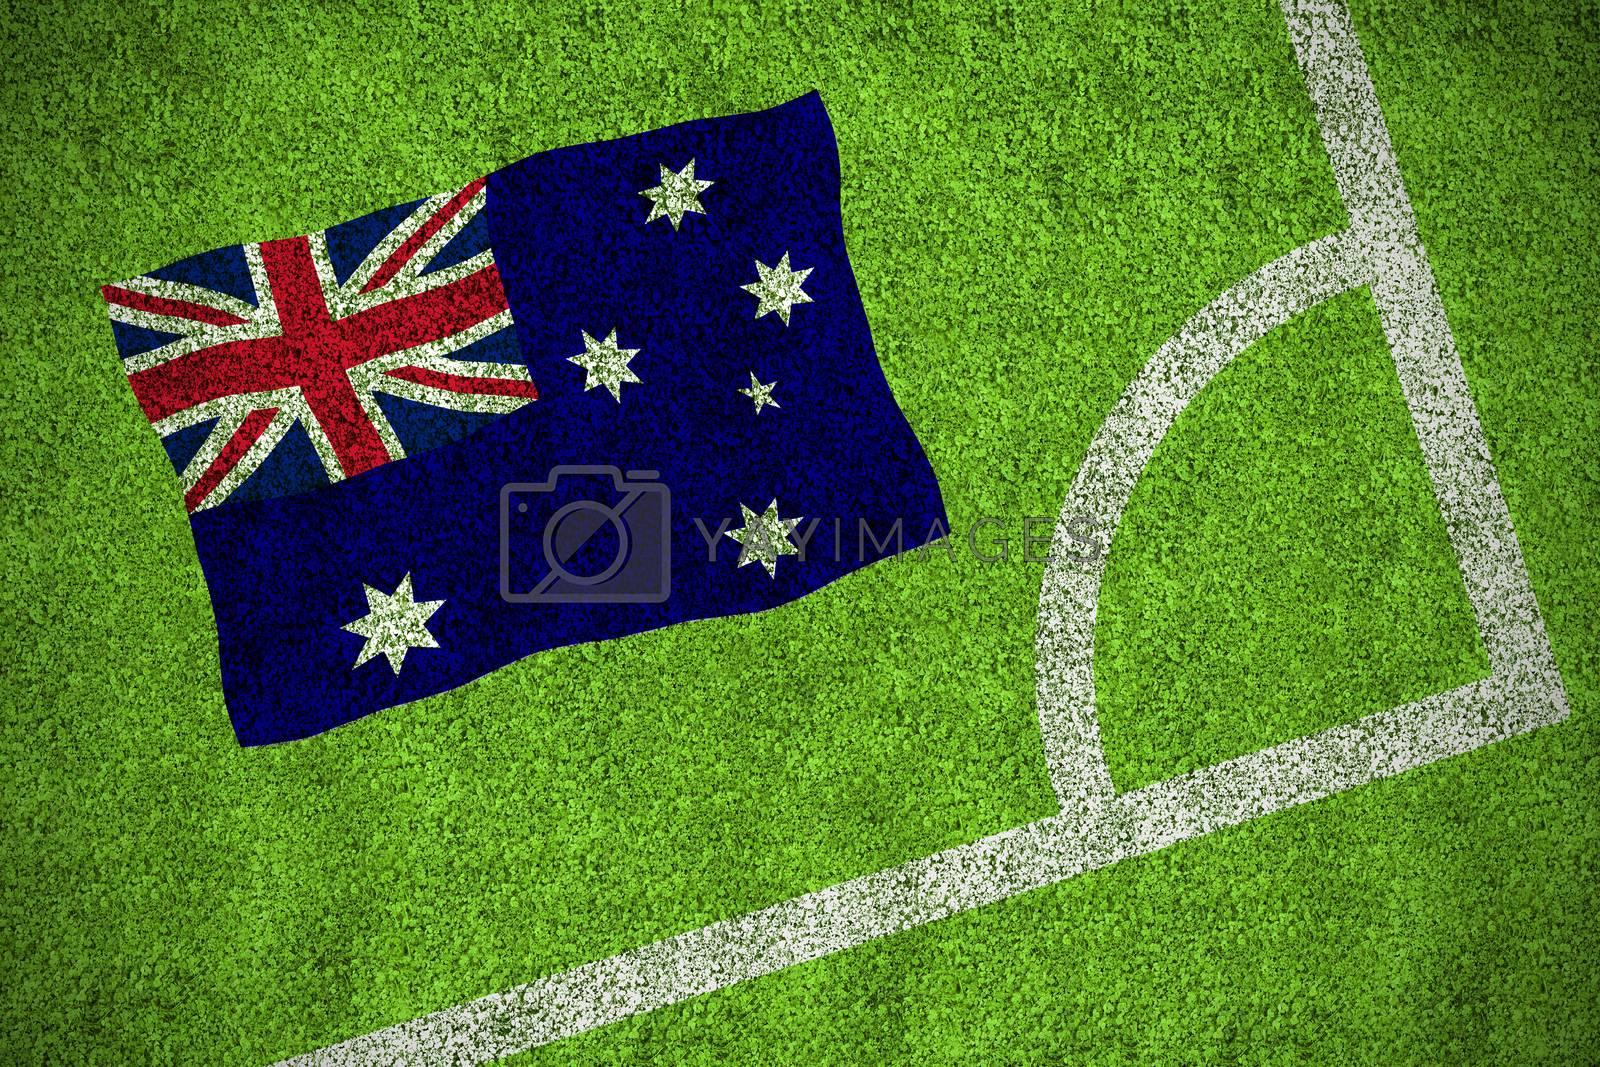 Australia national flag by Wavebreakmedia